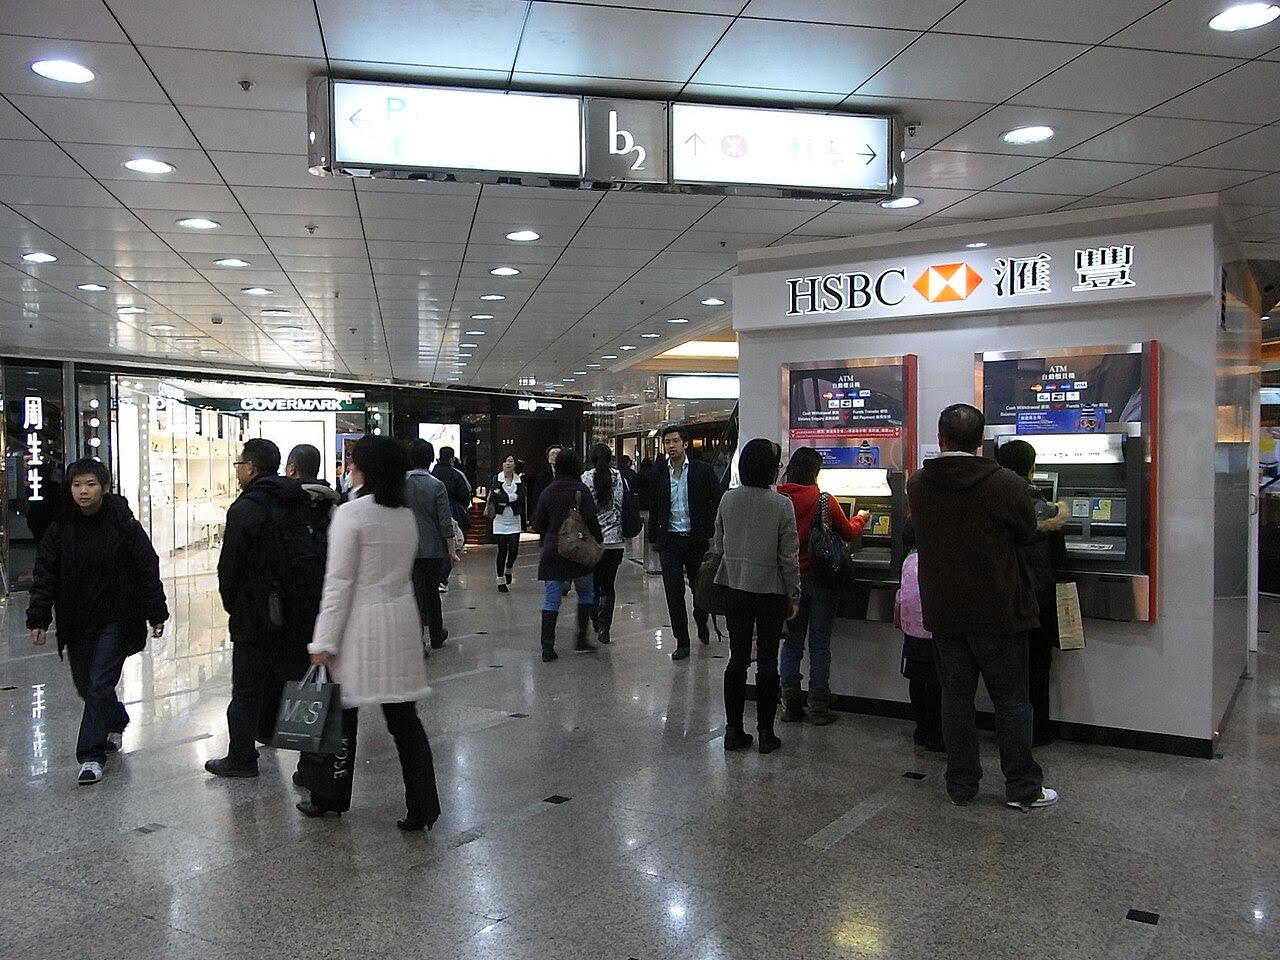 http://upload.wikimedia.org/wikipedia/commons/thumb/7/71/HK_Causeway_Bay_Times_Square_basement_interior_10_HSBC_ATM.JPG/1280px-HK_Causeway_Bay_Times_Square_basement_interior_10_HSBC_ATM.JPG